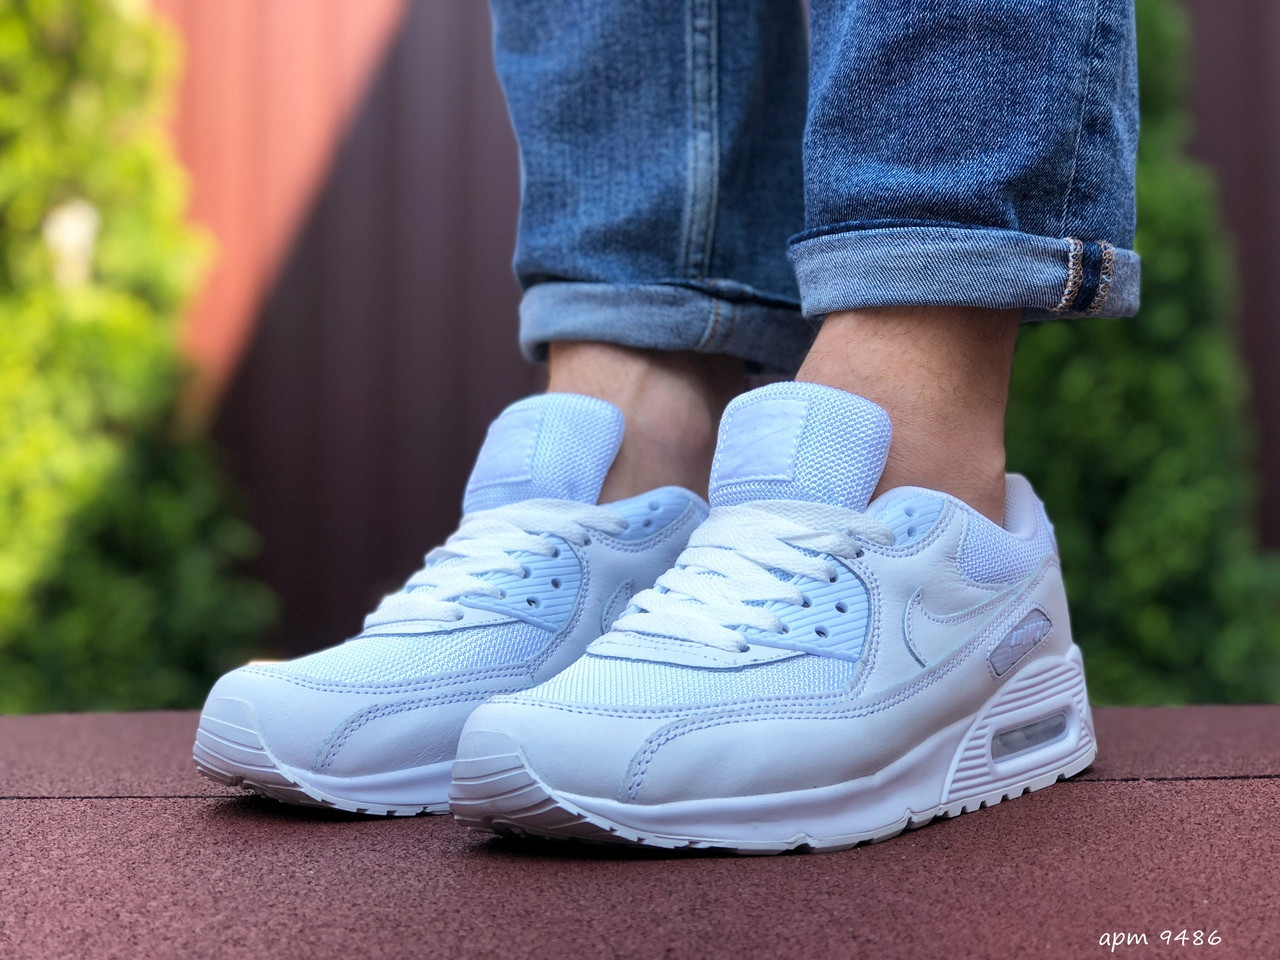 Мужские кроссовки Nike Air Max 90 (белые) 9486